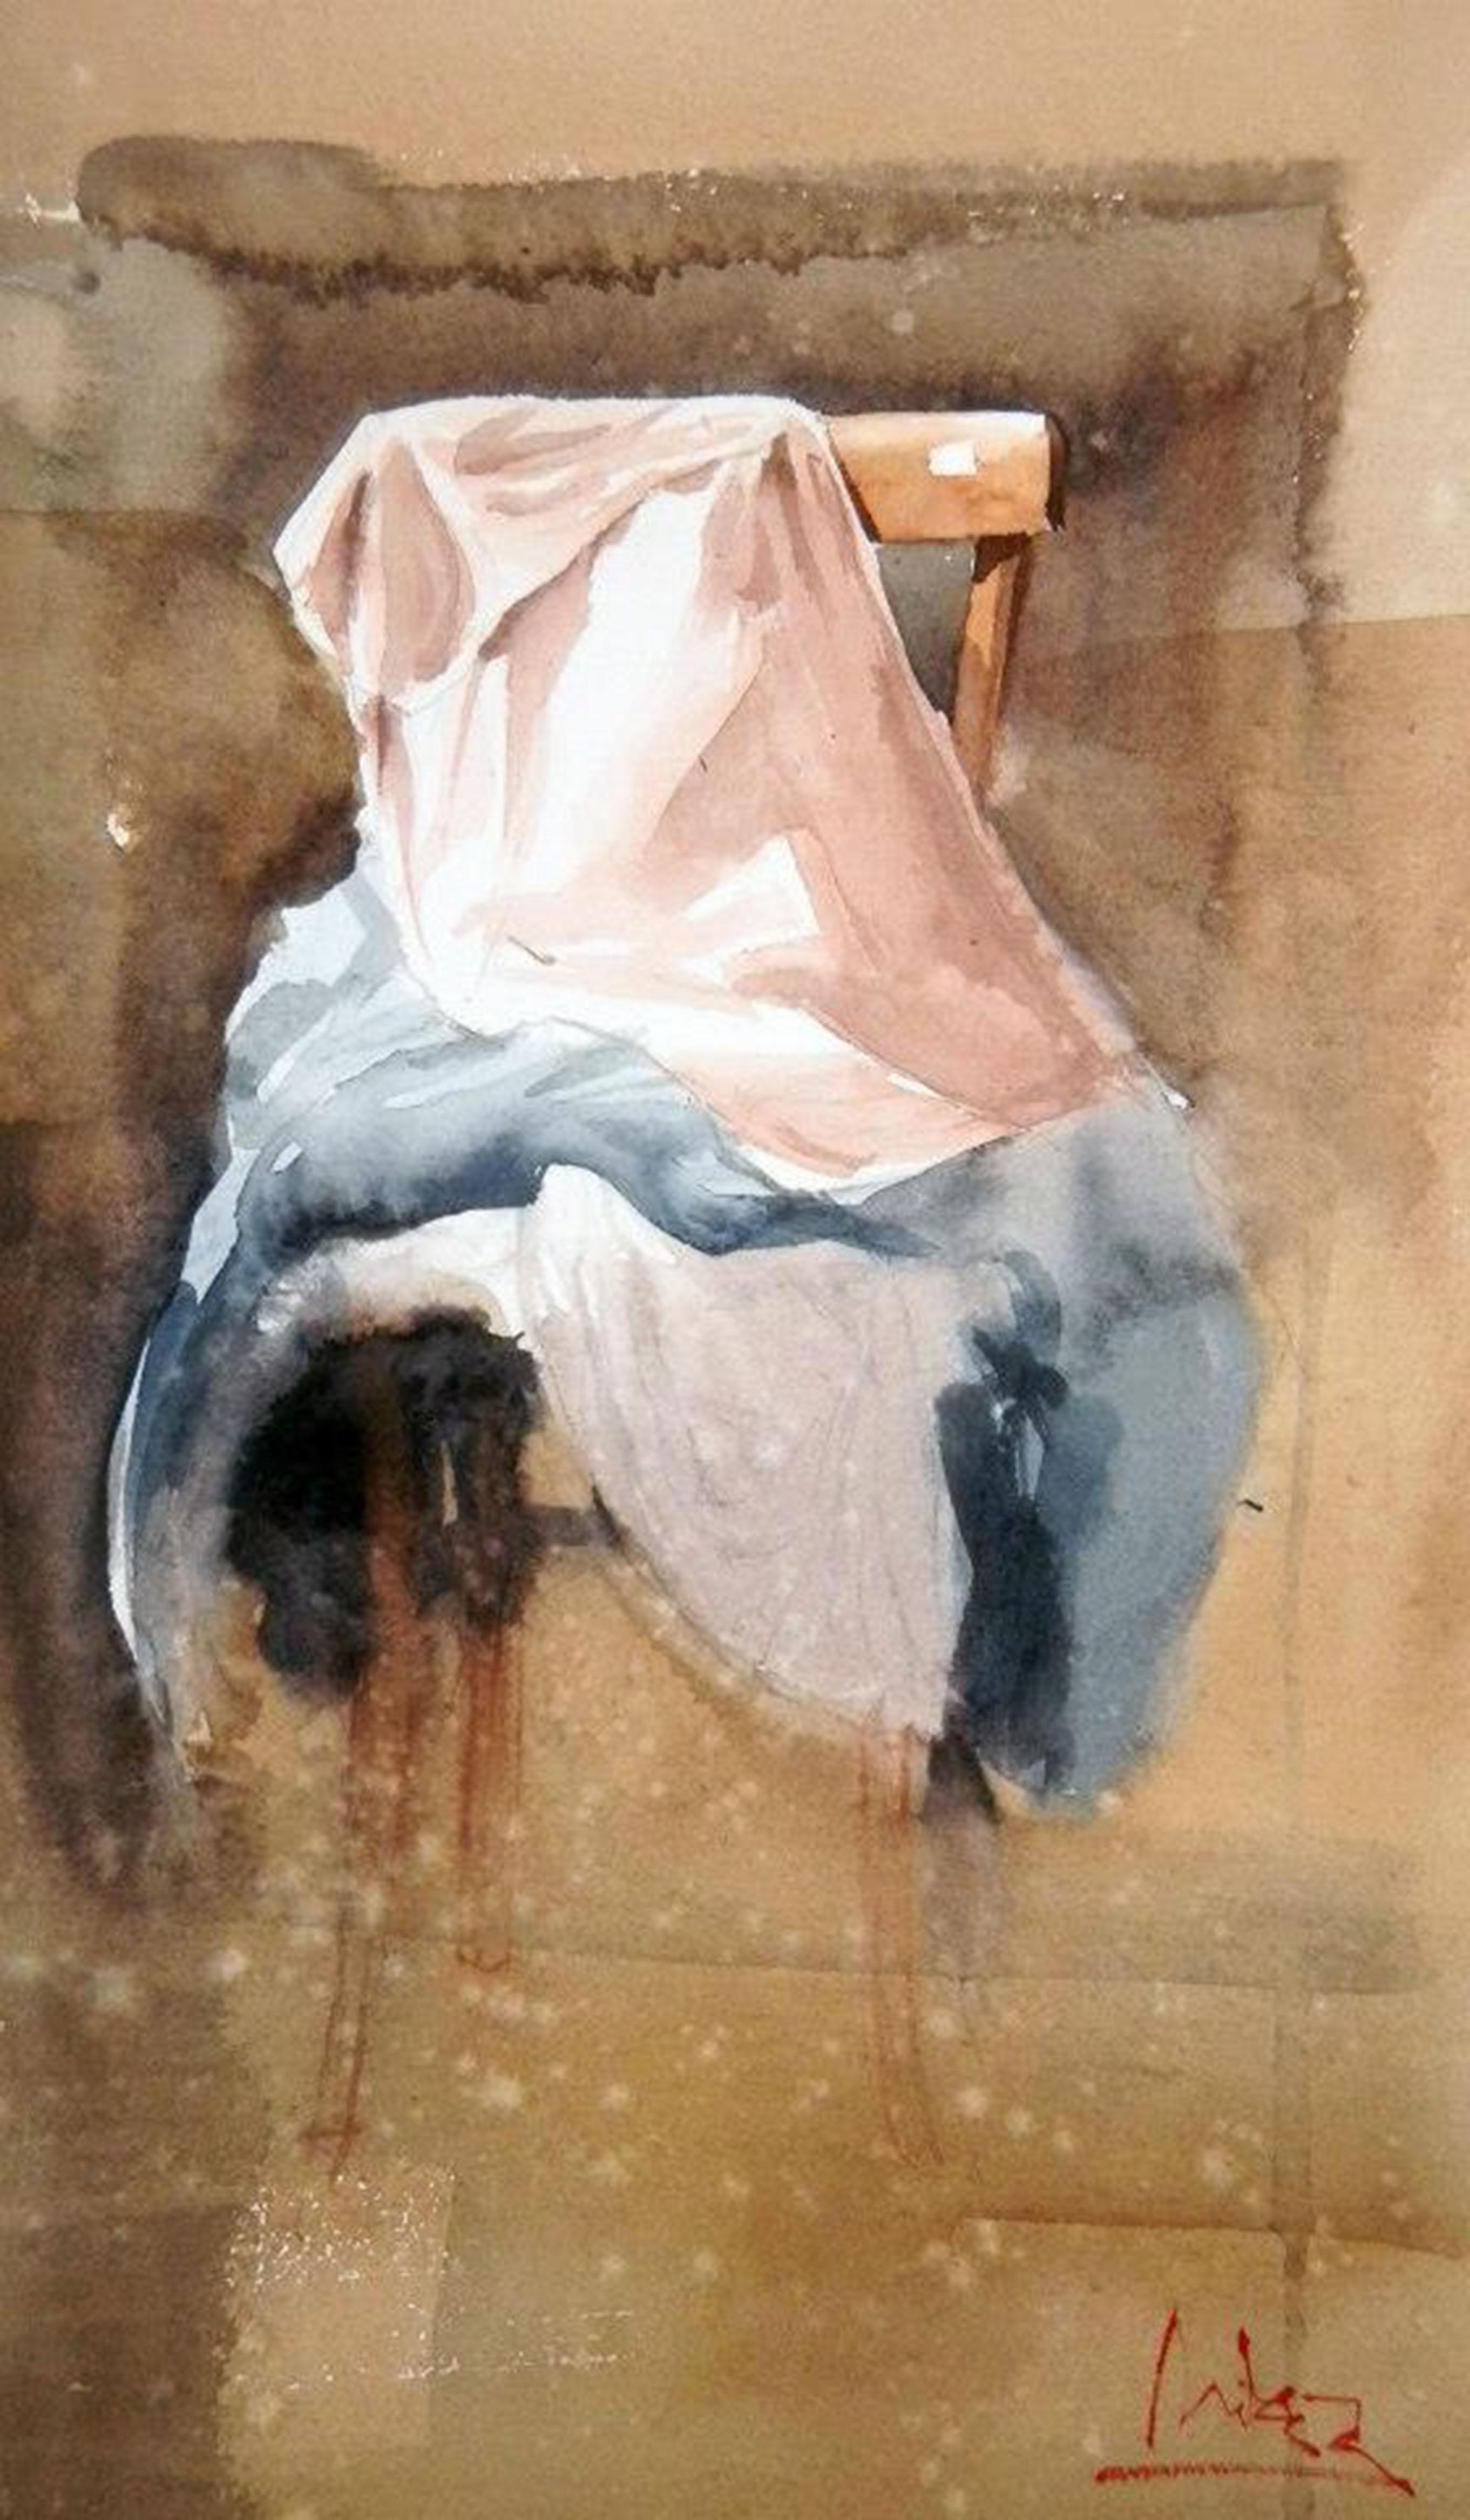 #WorldWatercolorGroup - watercolor by Dalibor Popovic Miksa of fabric - #doodlewash